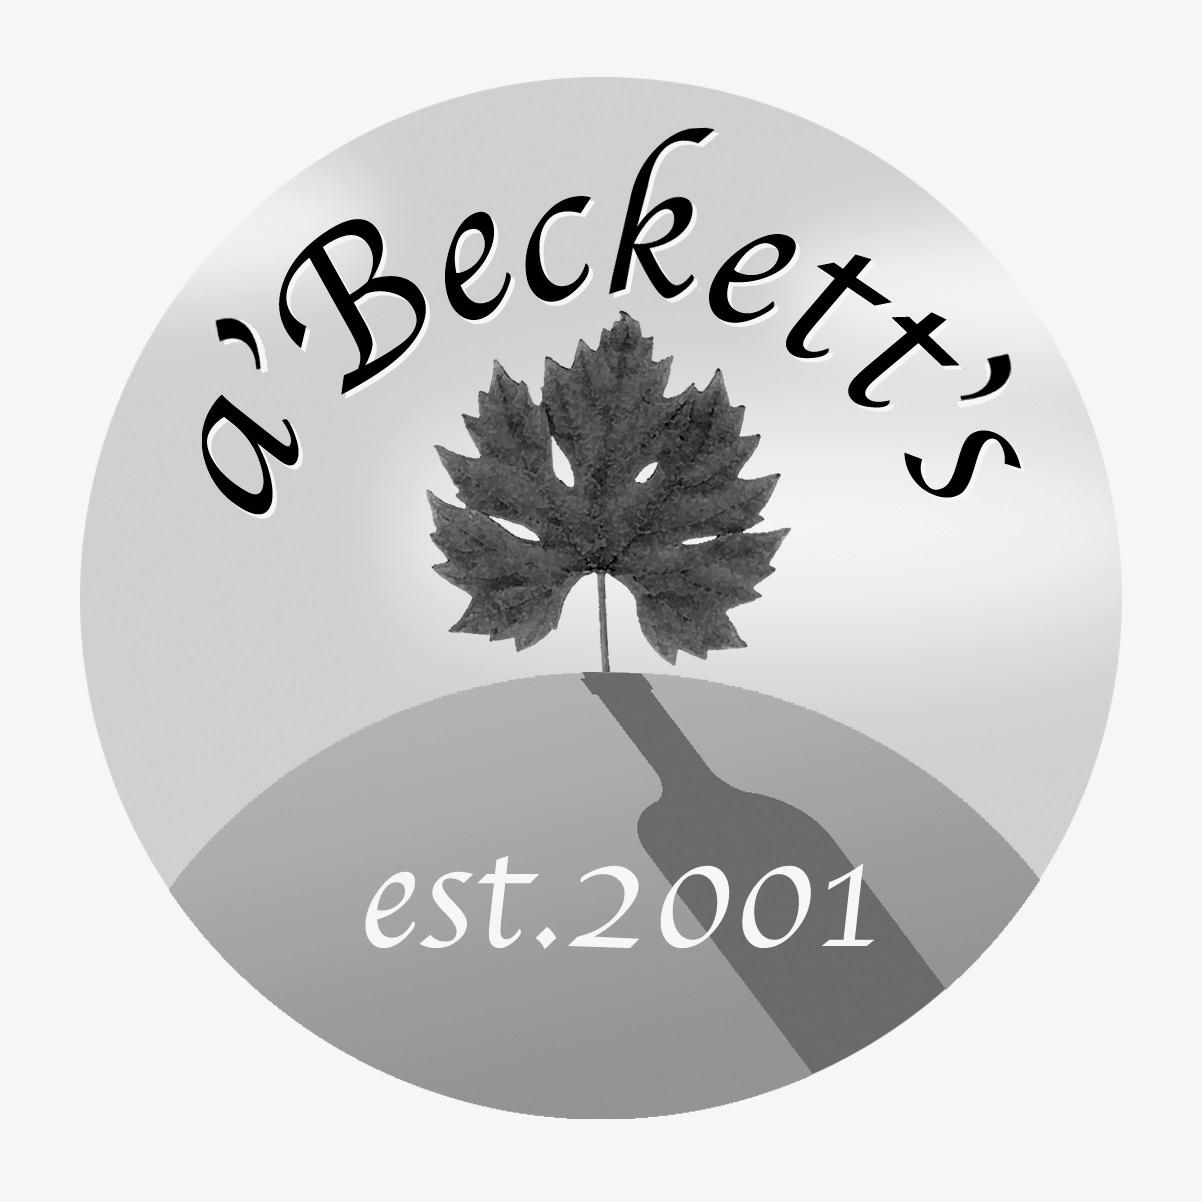 abecketts circular logo bw.jpg